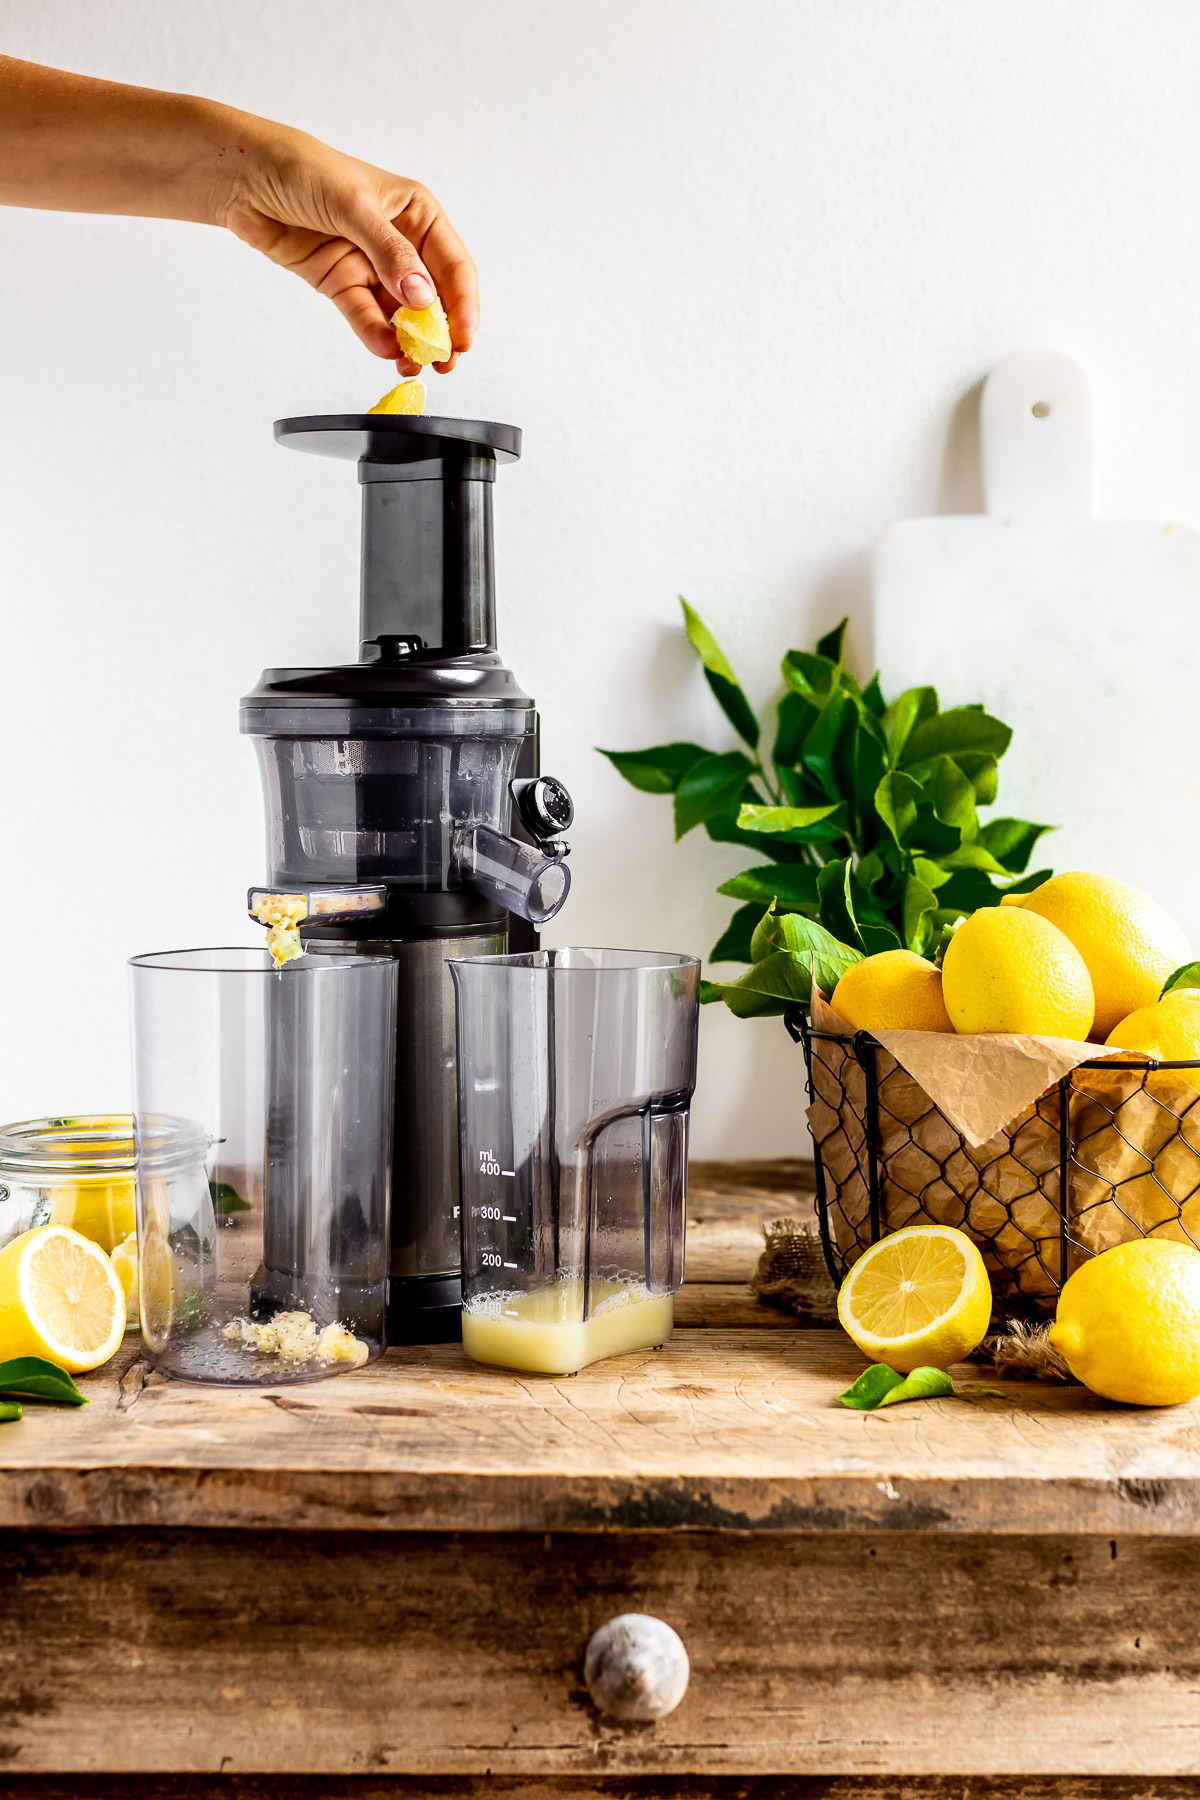 CROSTATA al LIMONE VEGAN con pasta FROLLA ALLE MANDORLE senza glutine succo di limone vegan Gluten-Free Vegan Lemon Tart with Almond Crust and lemon juice